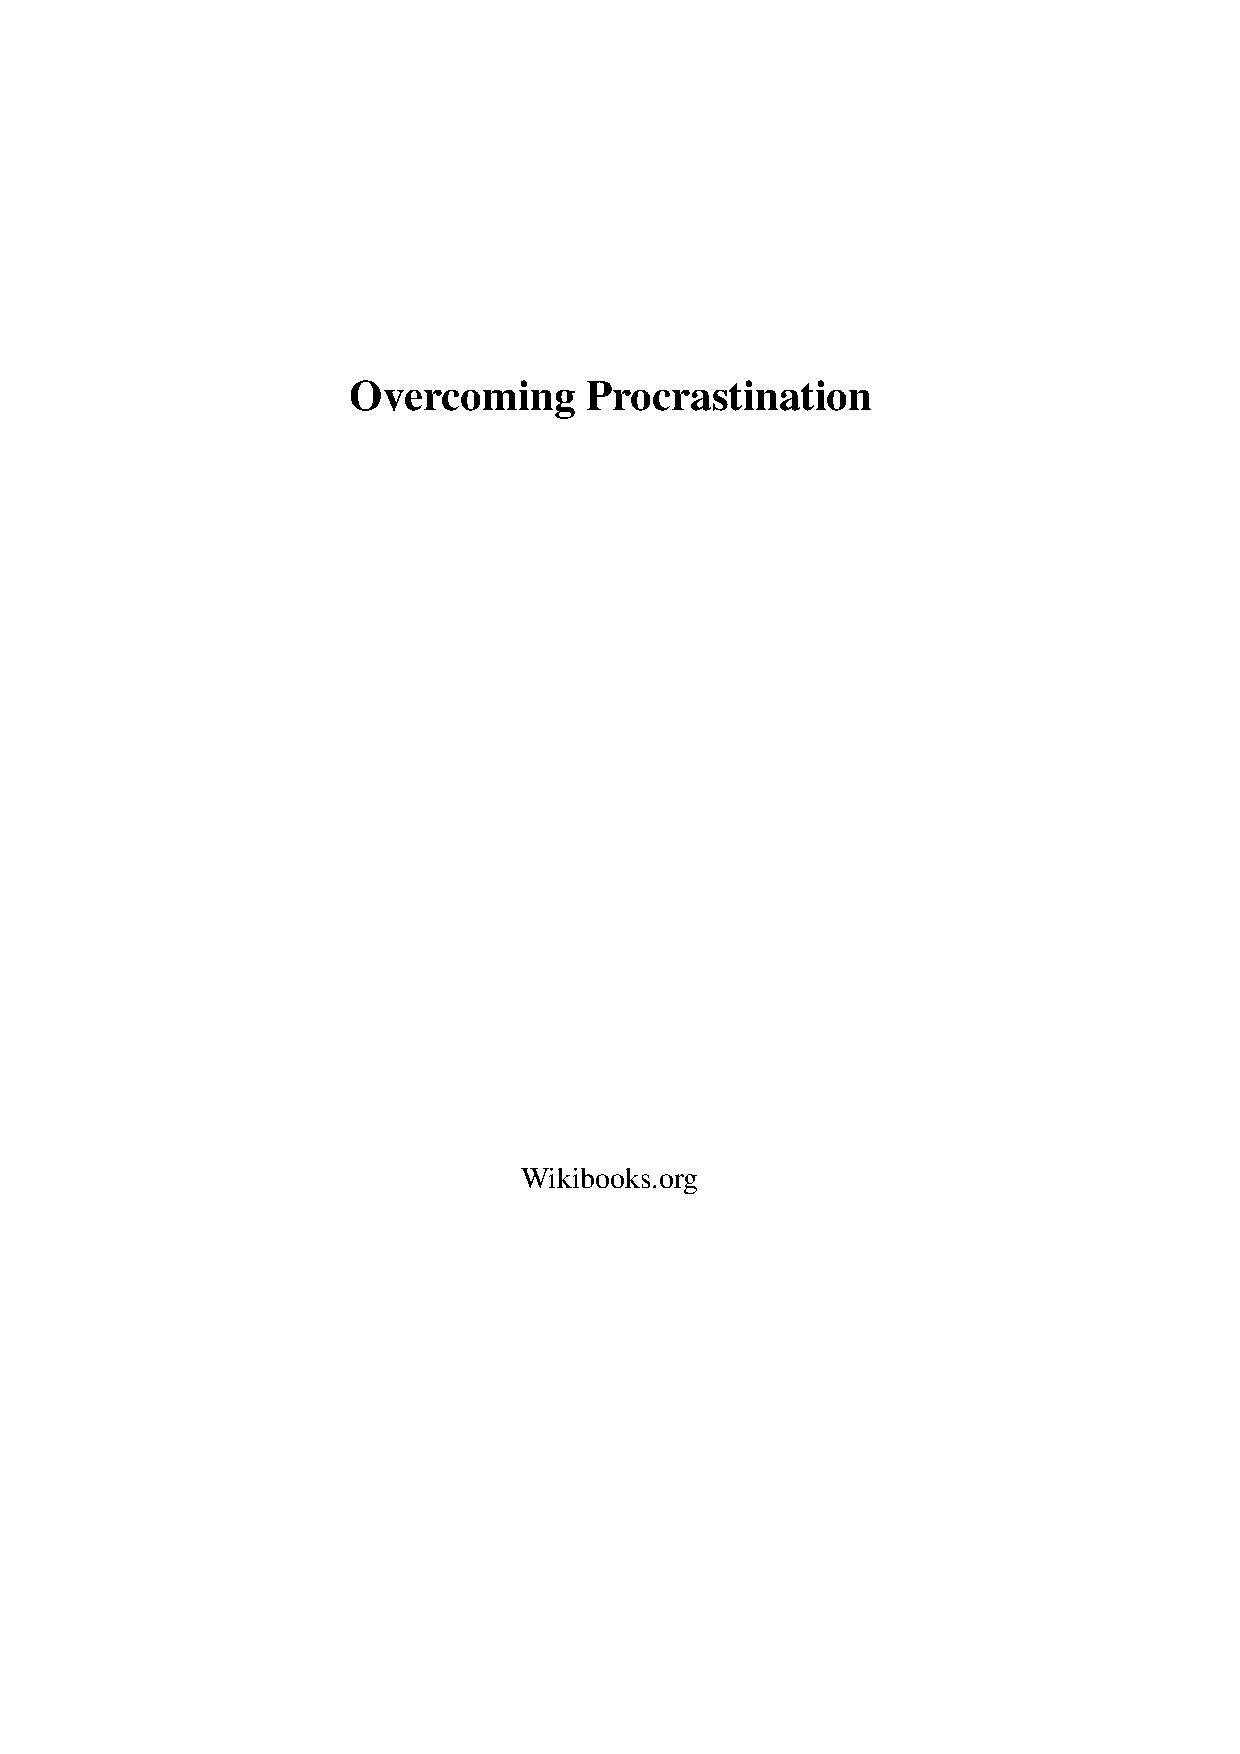 Overcoming Procrastination.pdf